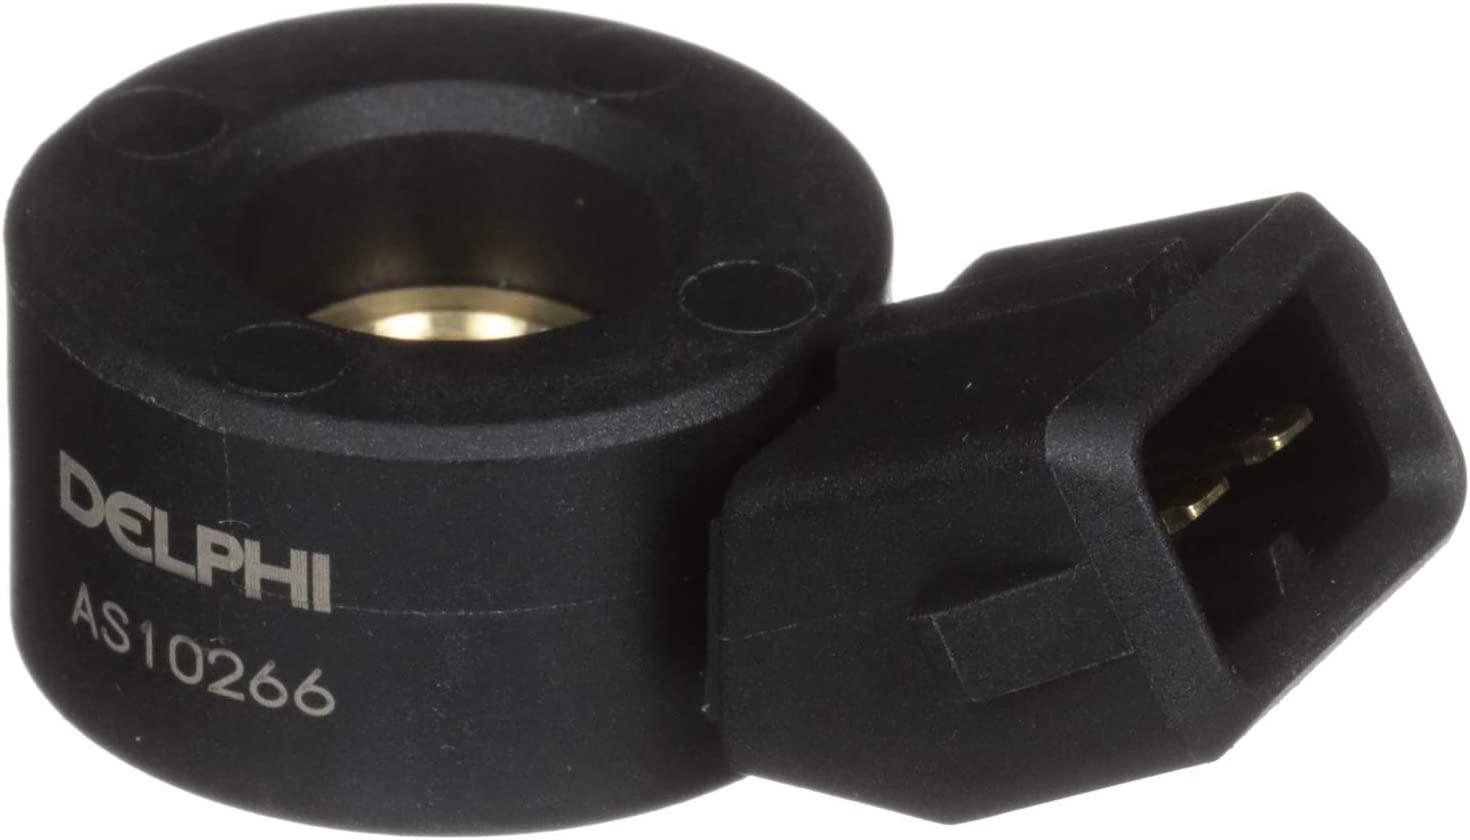 Delphi AS10266 Knock Sensor